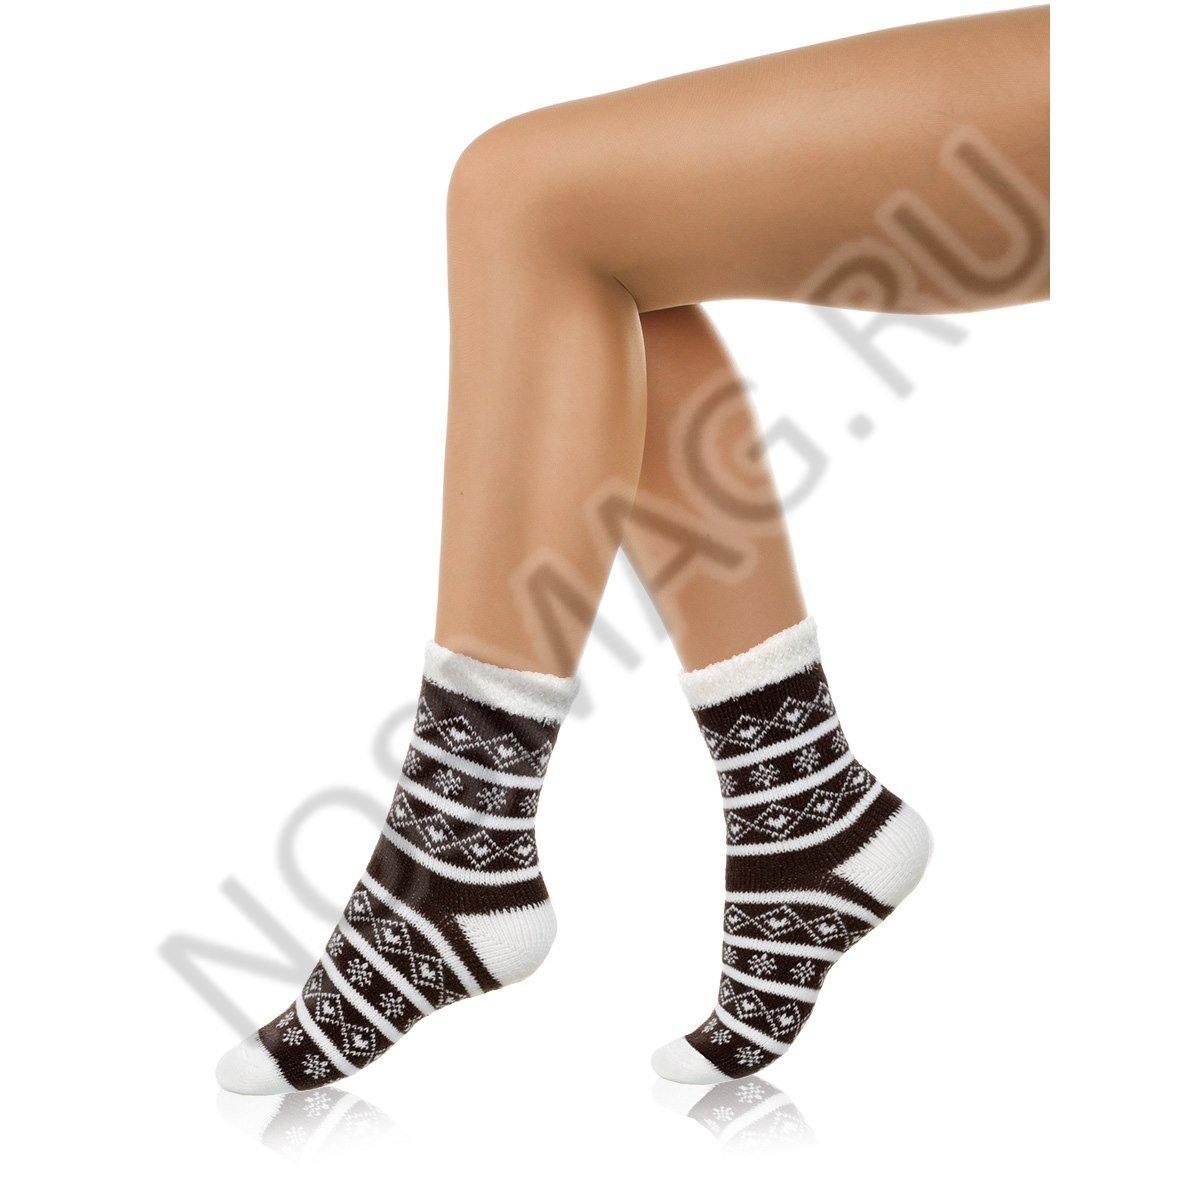 Носки женские Charmante коричневые